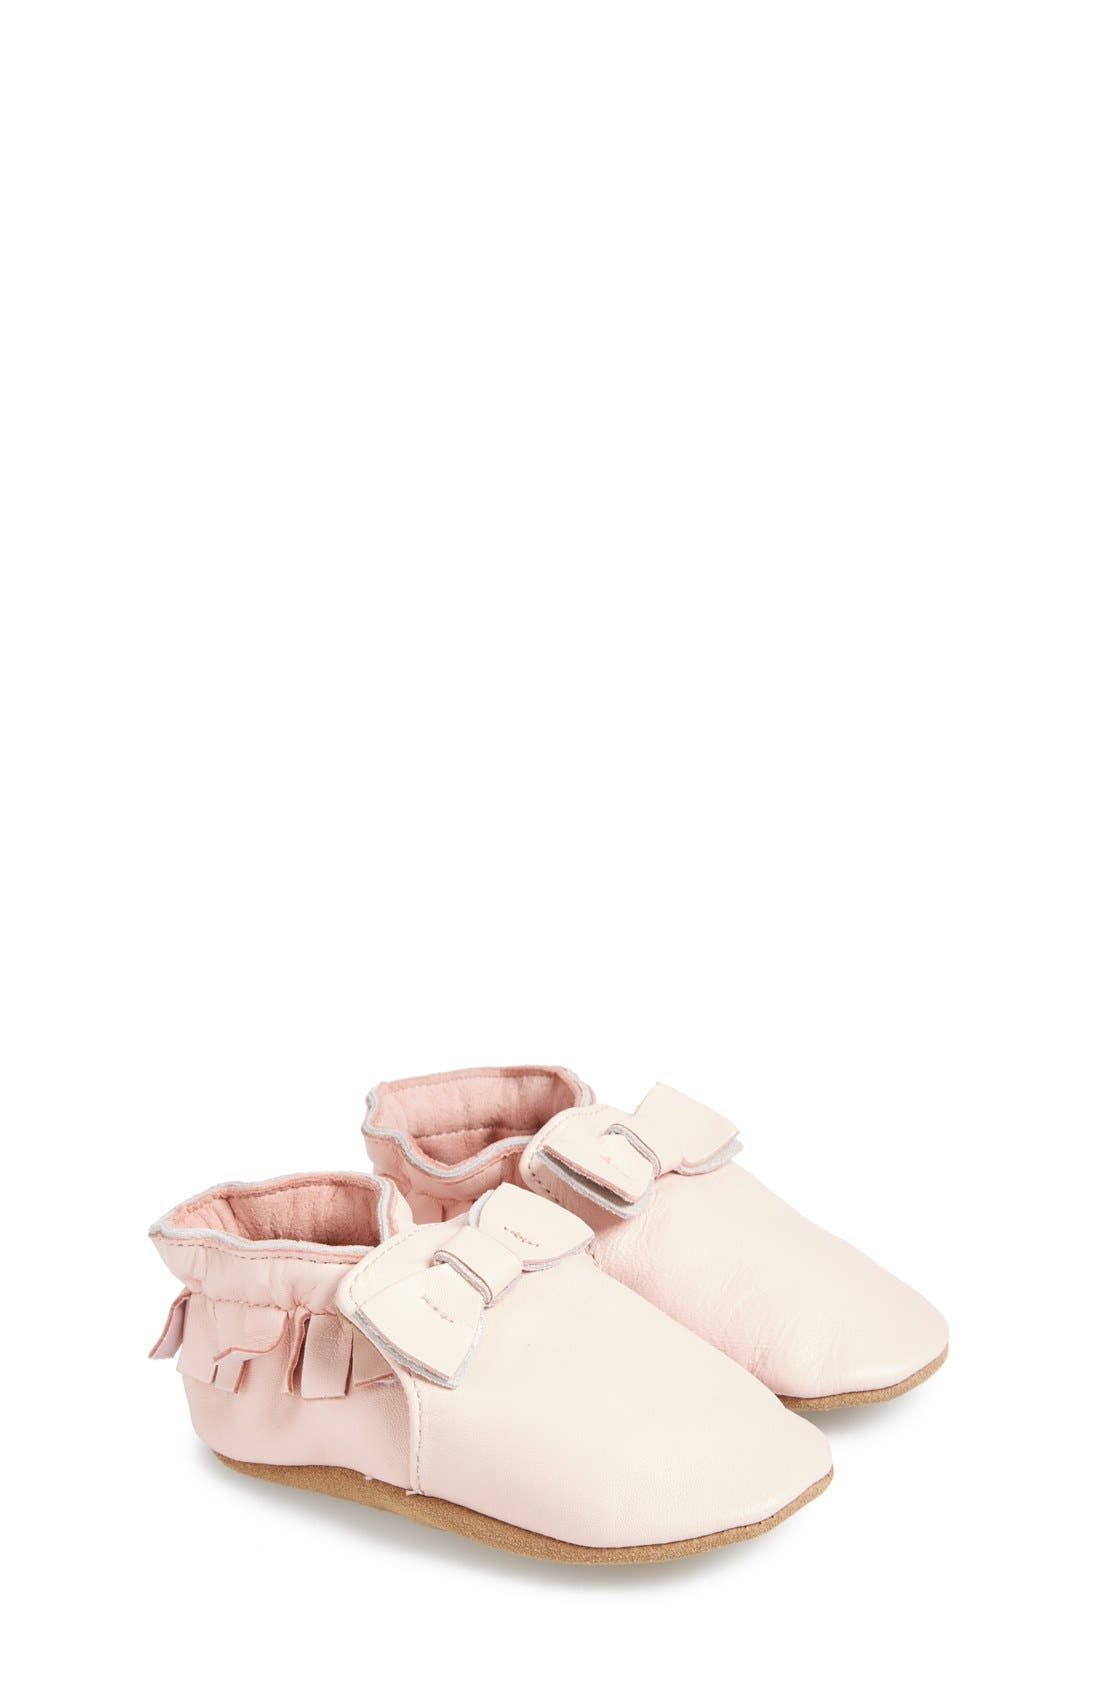 'Maggie Moccasin' Crib Shoe,                             Main thumbnail 1, color,                             PASTEL PINK